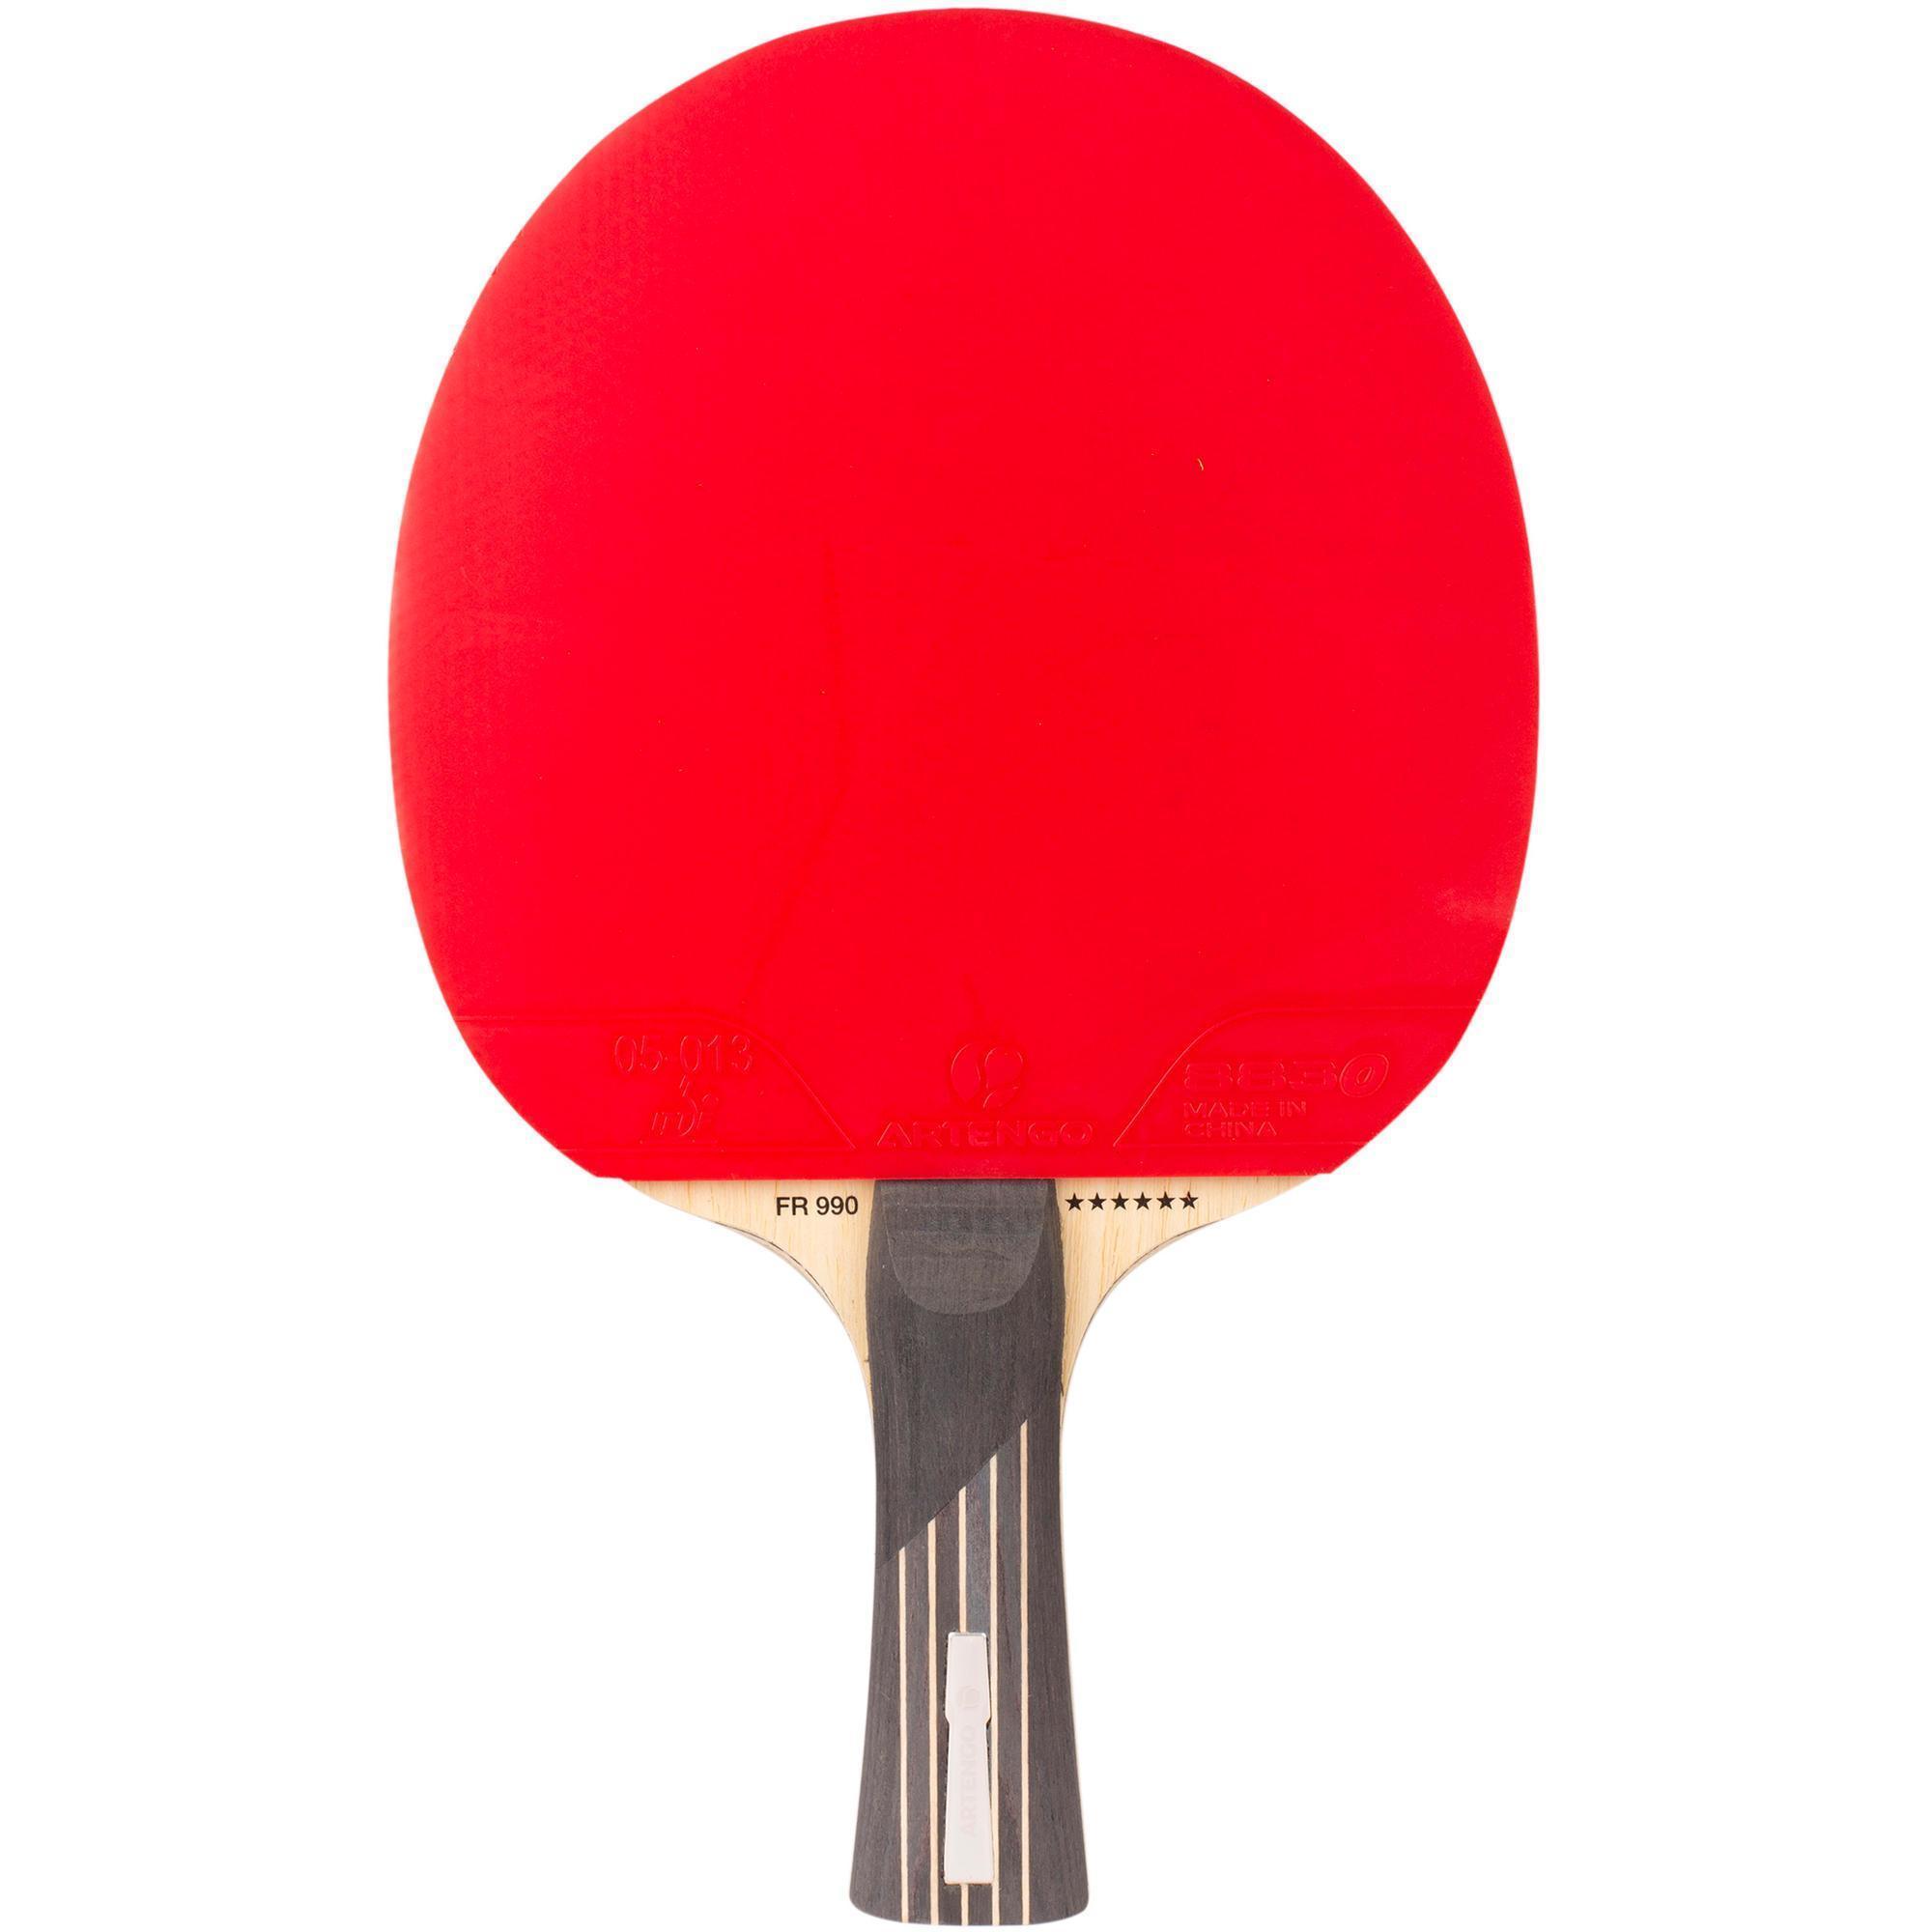 Fr 990 6 table tennis bat artengo for Table 4 en 1 intersport